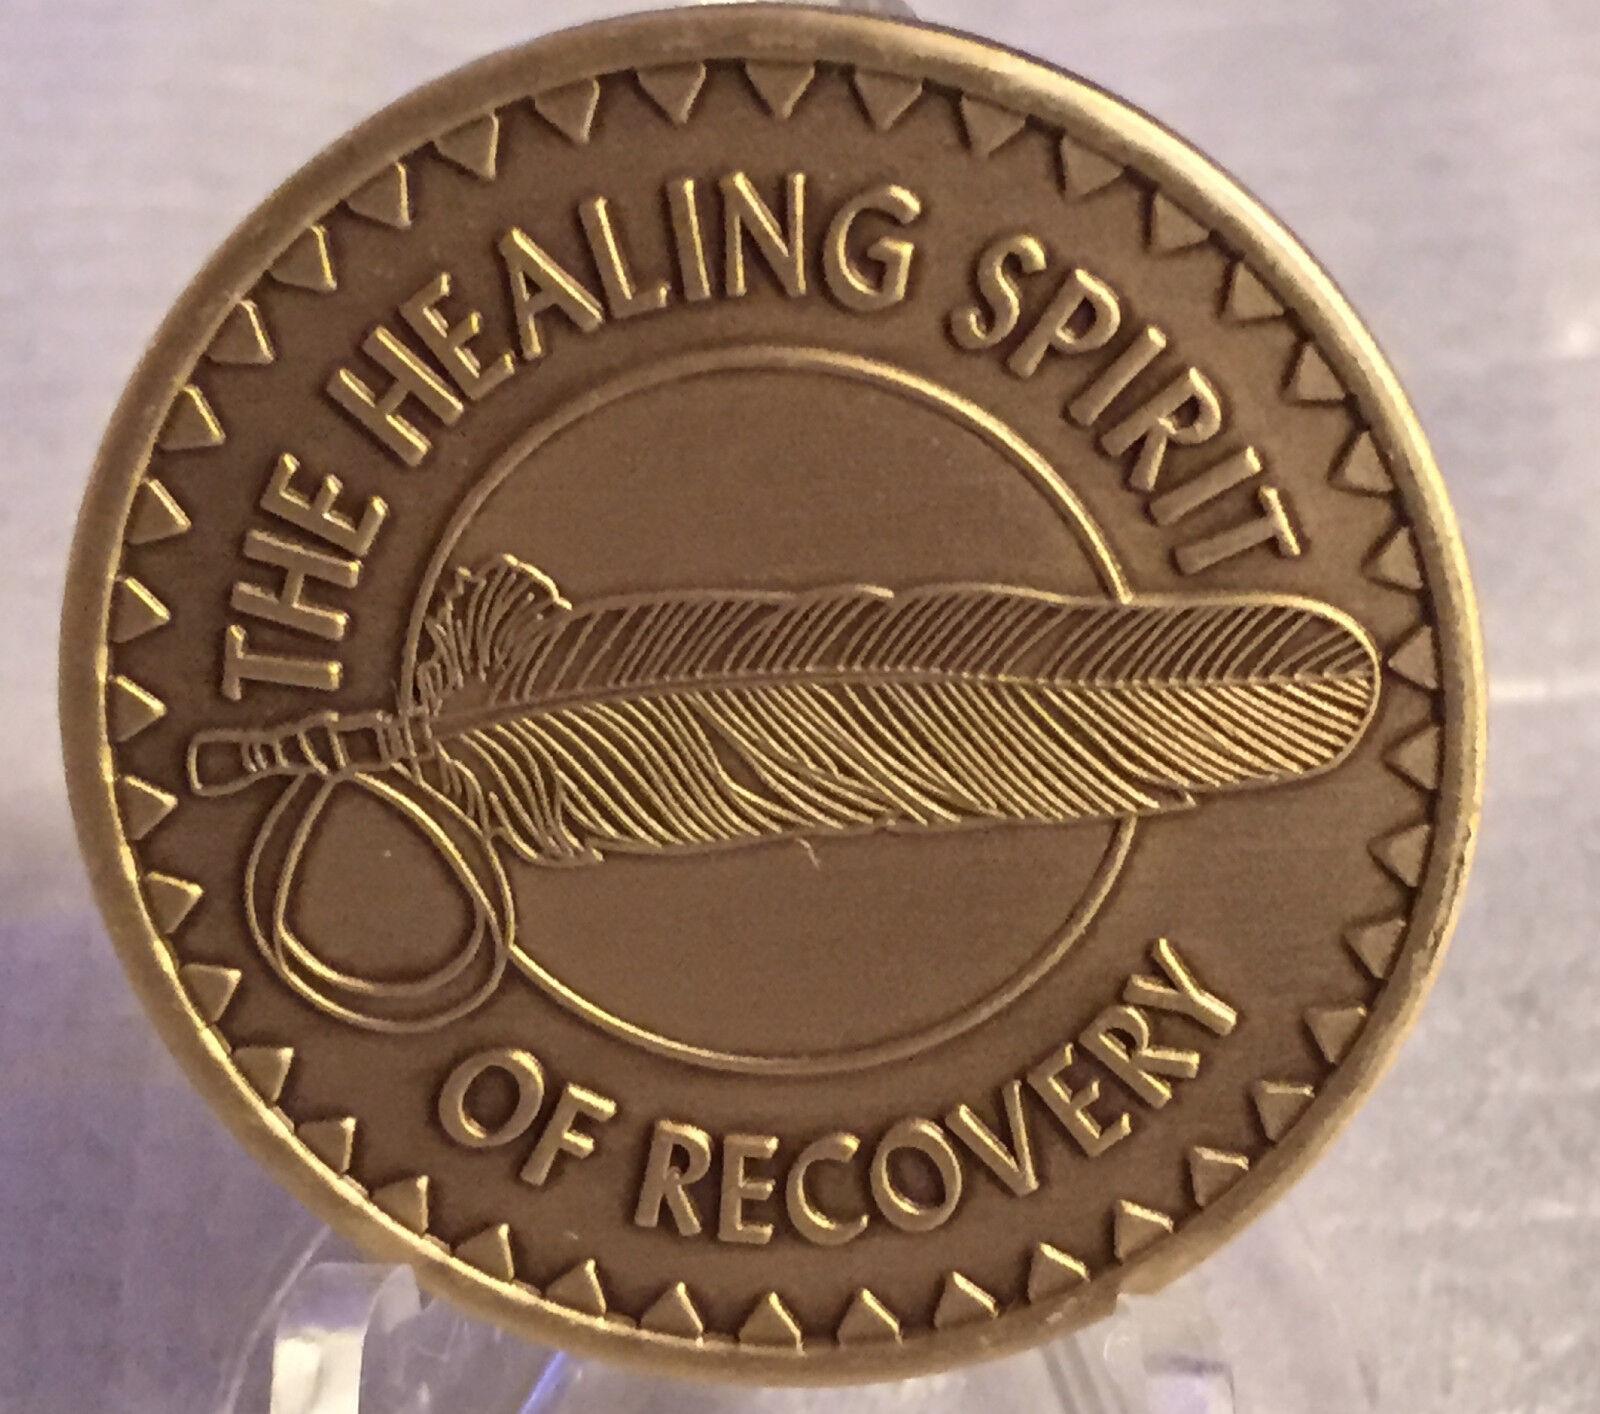 Healing Spirit of Recovery Medallion Chip Coin AA NA Great Spirit Prayer Bronze